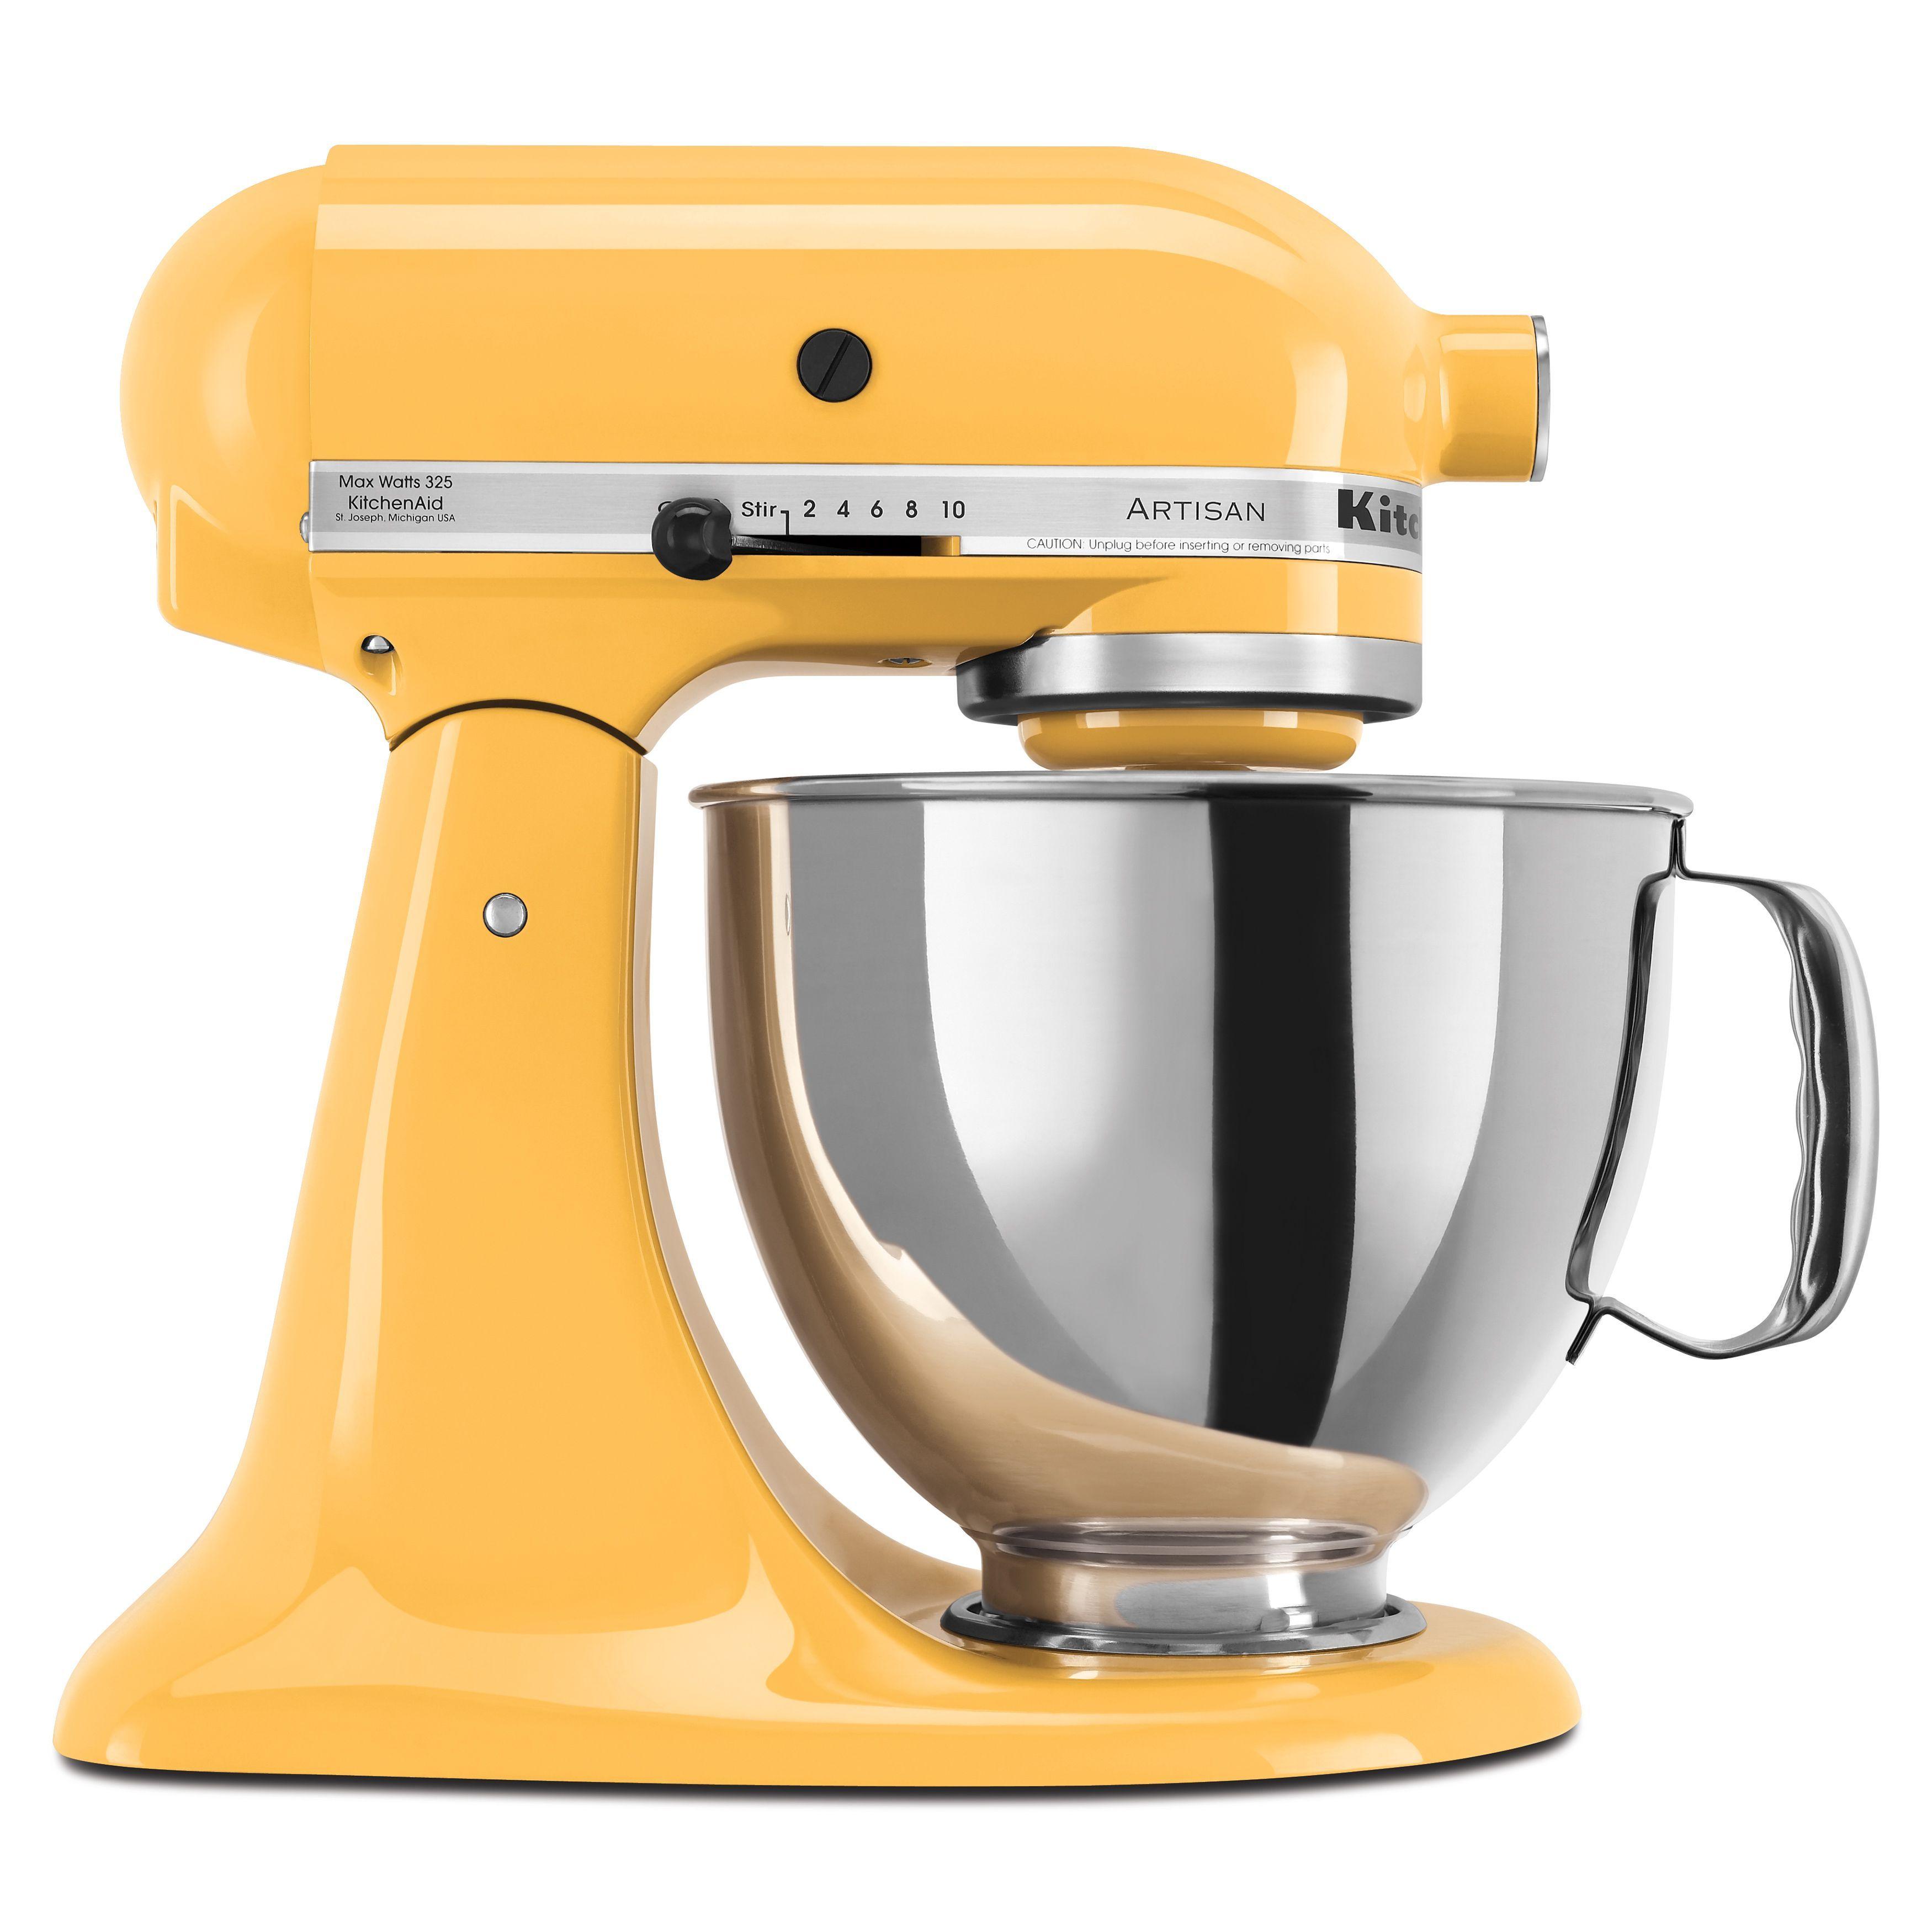 KitchenAid KSM150PSBF ercup Artisan Series 5-quart Stand Mixer ... on amana corporation, kenwood limited, sunbeam products, whirlpool canada, whirlpool corporation, hamilton beach brands, kenwood chef, meyer corporation,